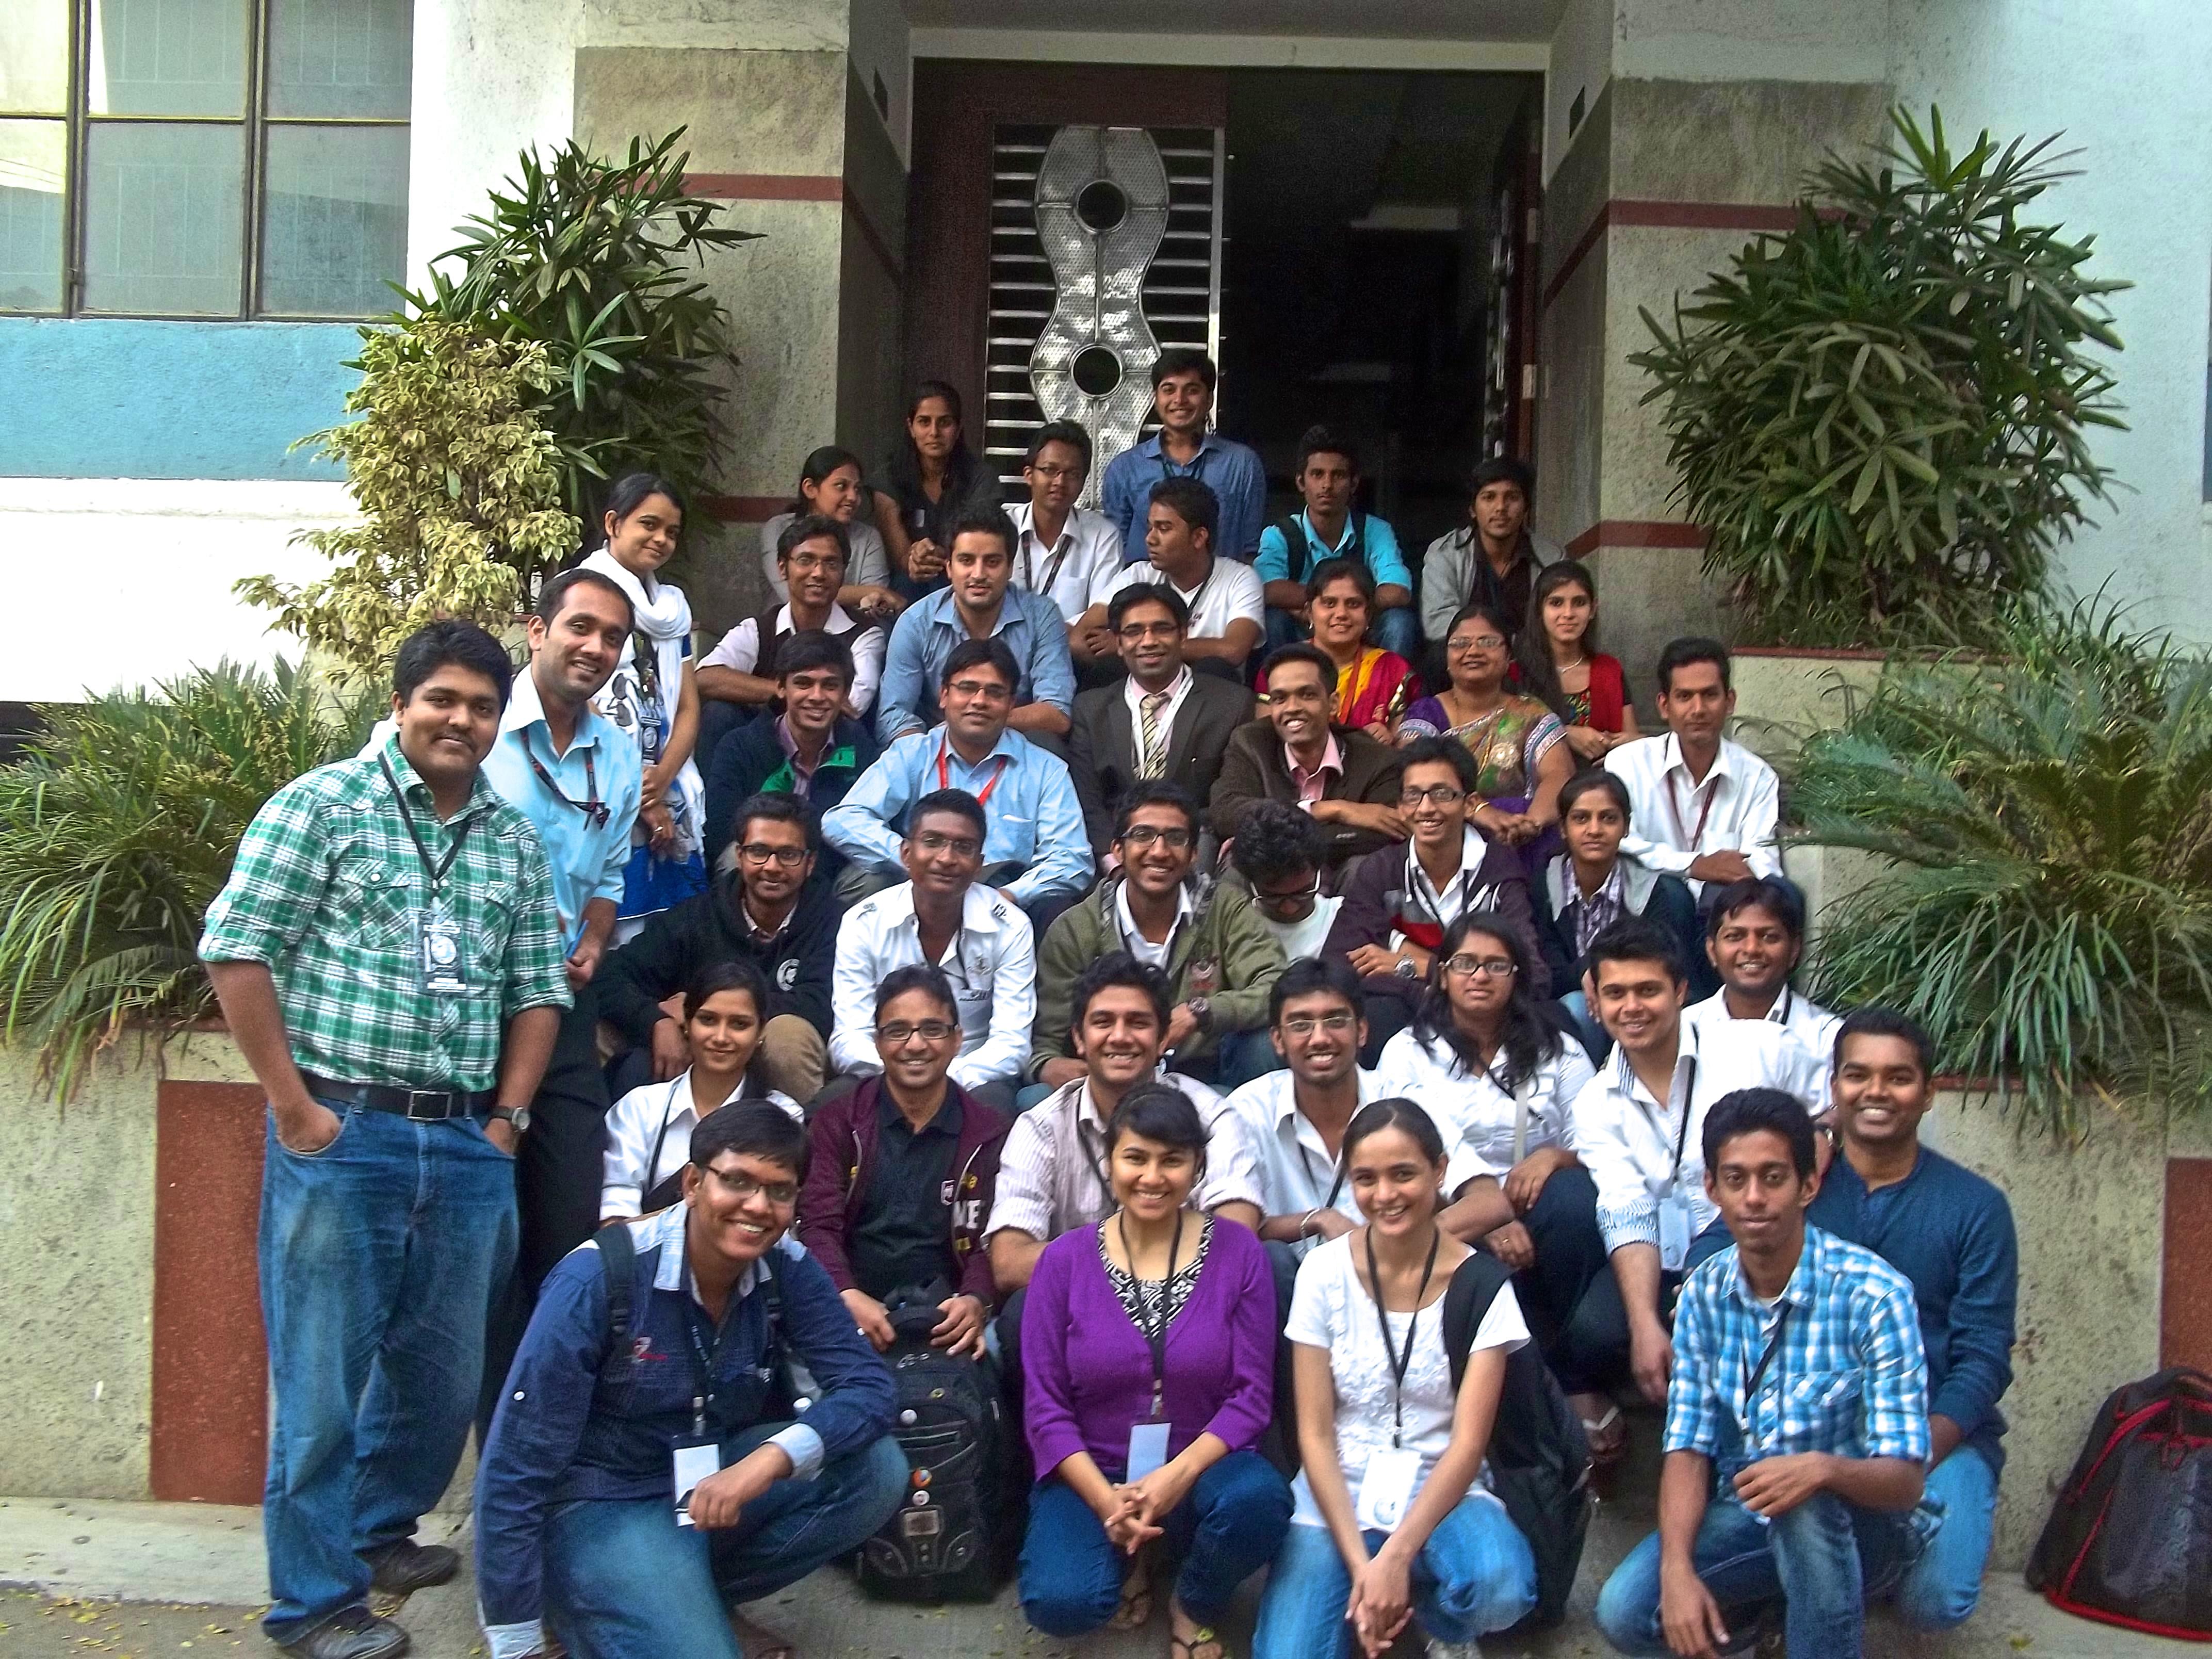 Celebrating the success of Wikipedia in Wikipedia Summit Pune 2013